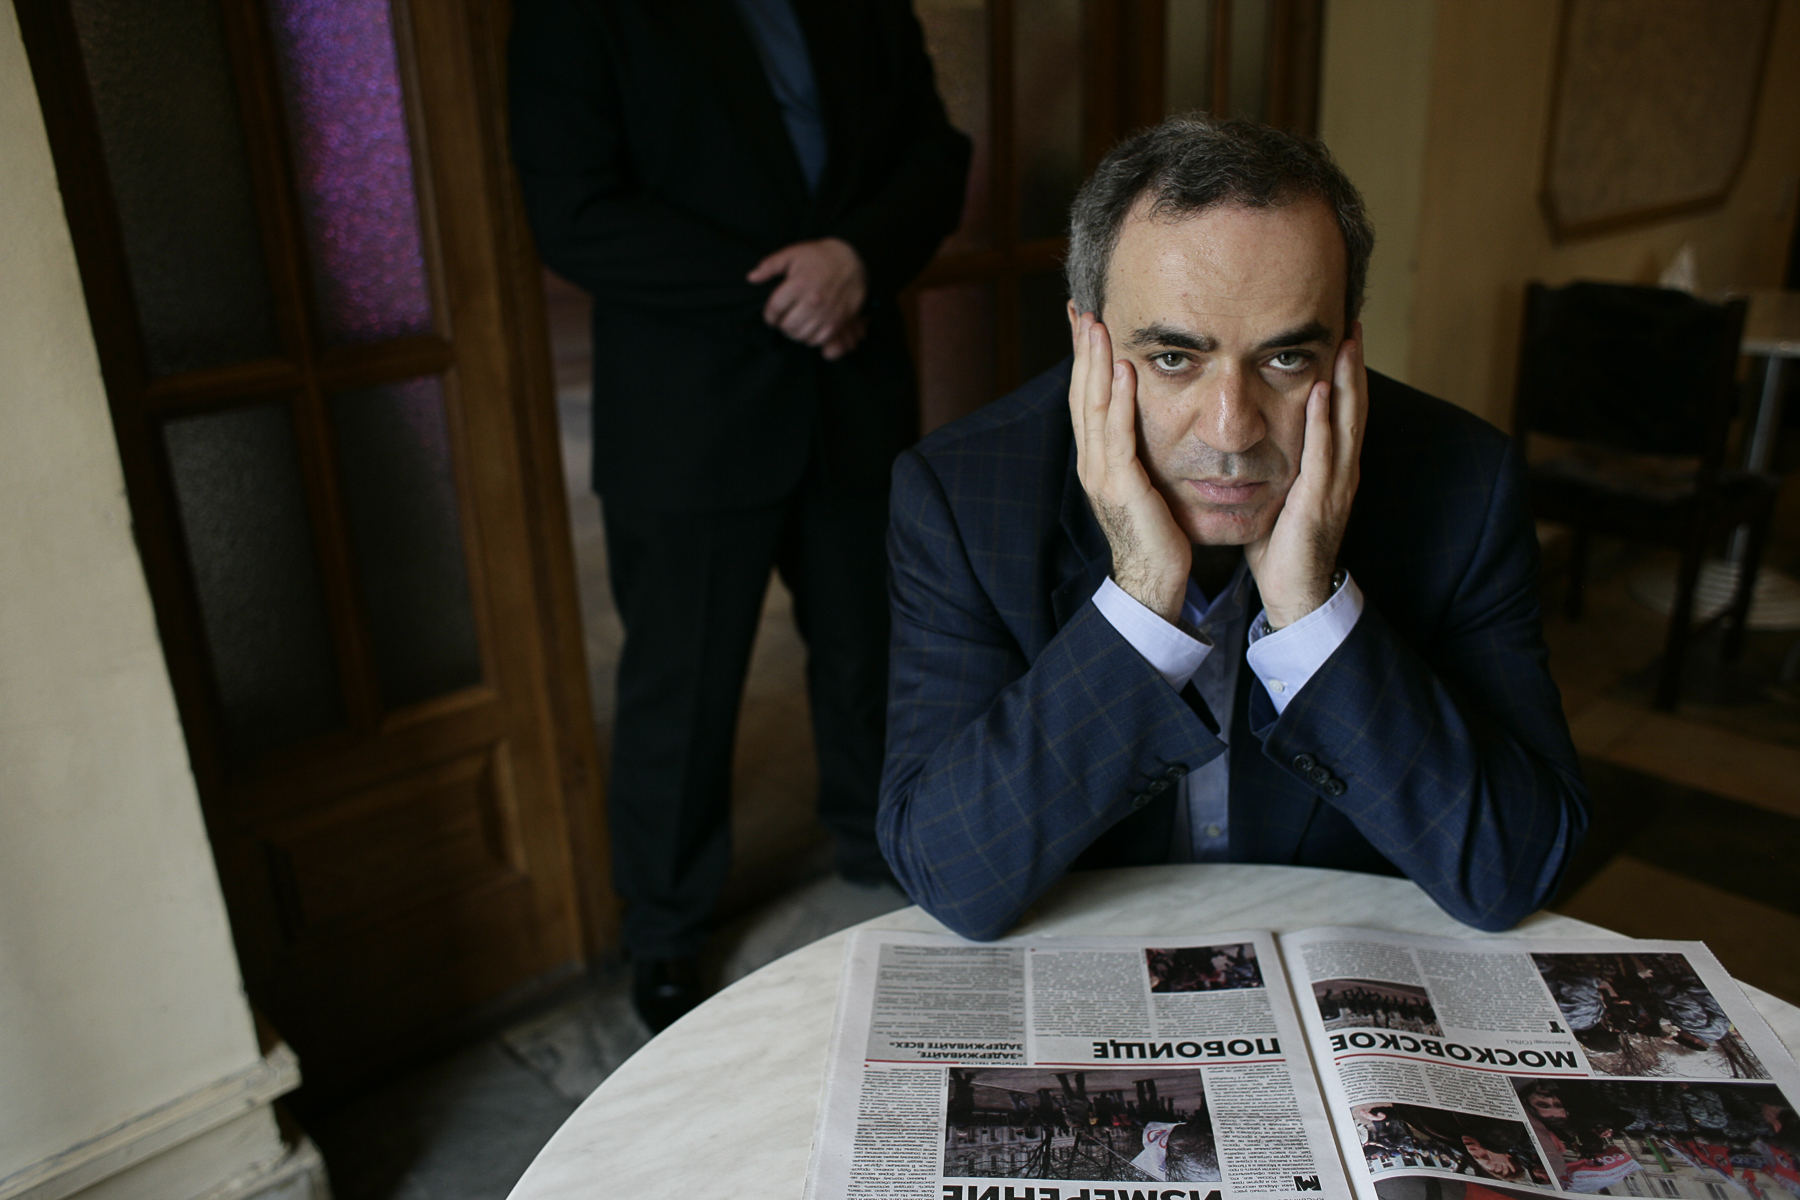 Russie mai 2007. Gary Kasparov à Moscou.Russia May 2007. Gary Kasparov in Moscow.